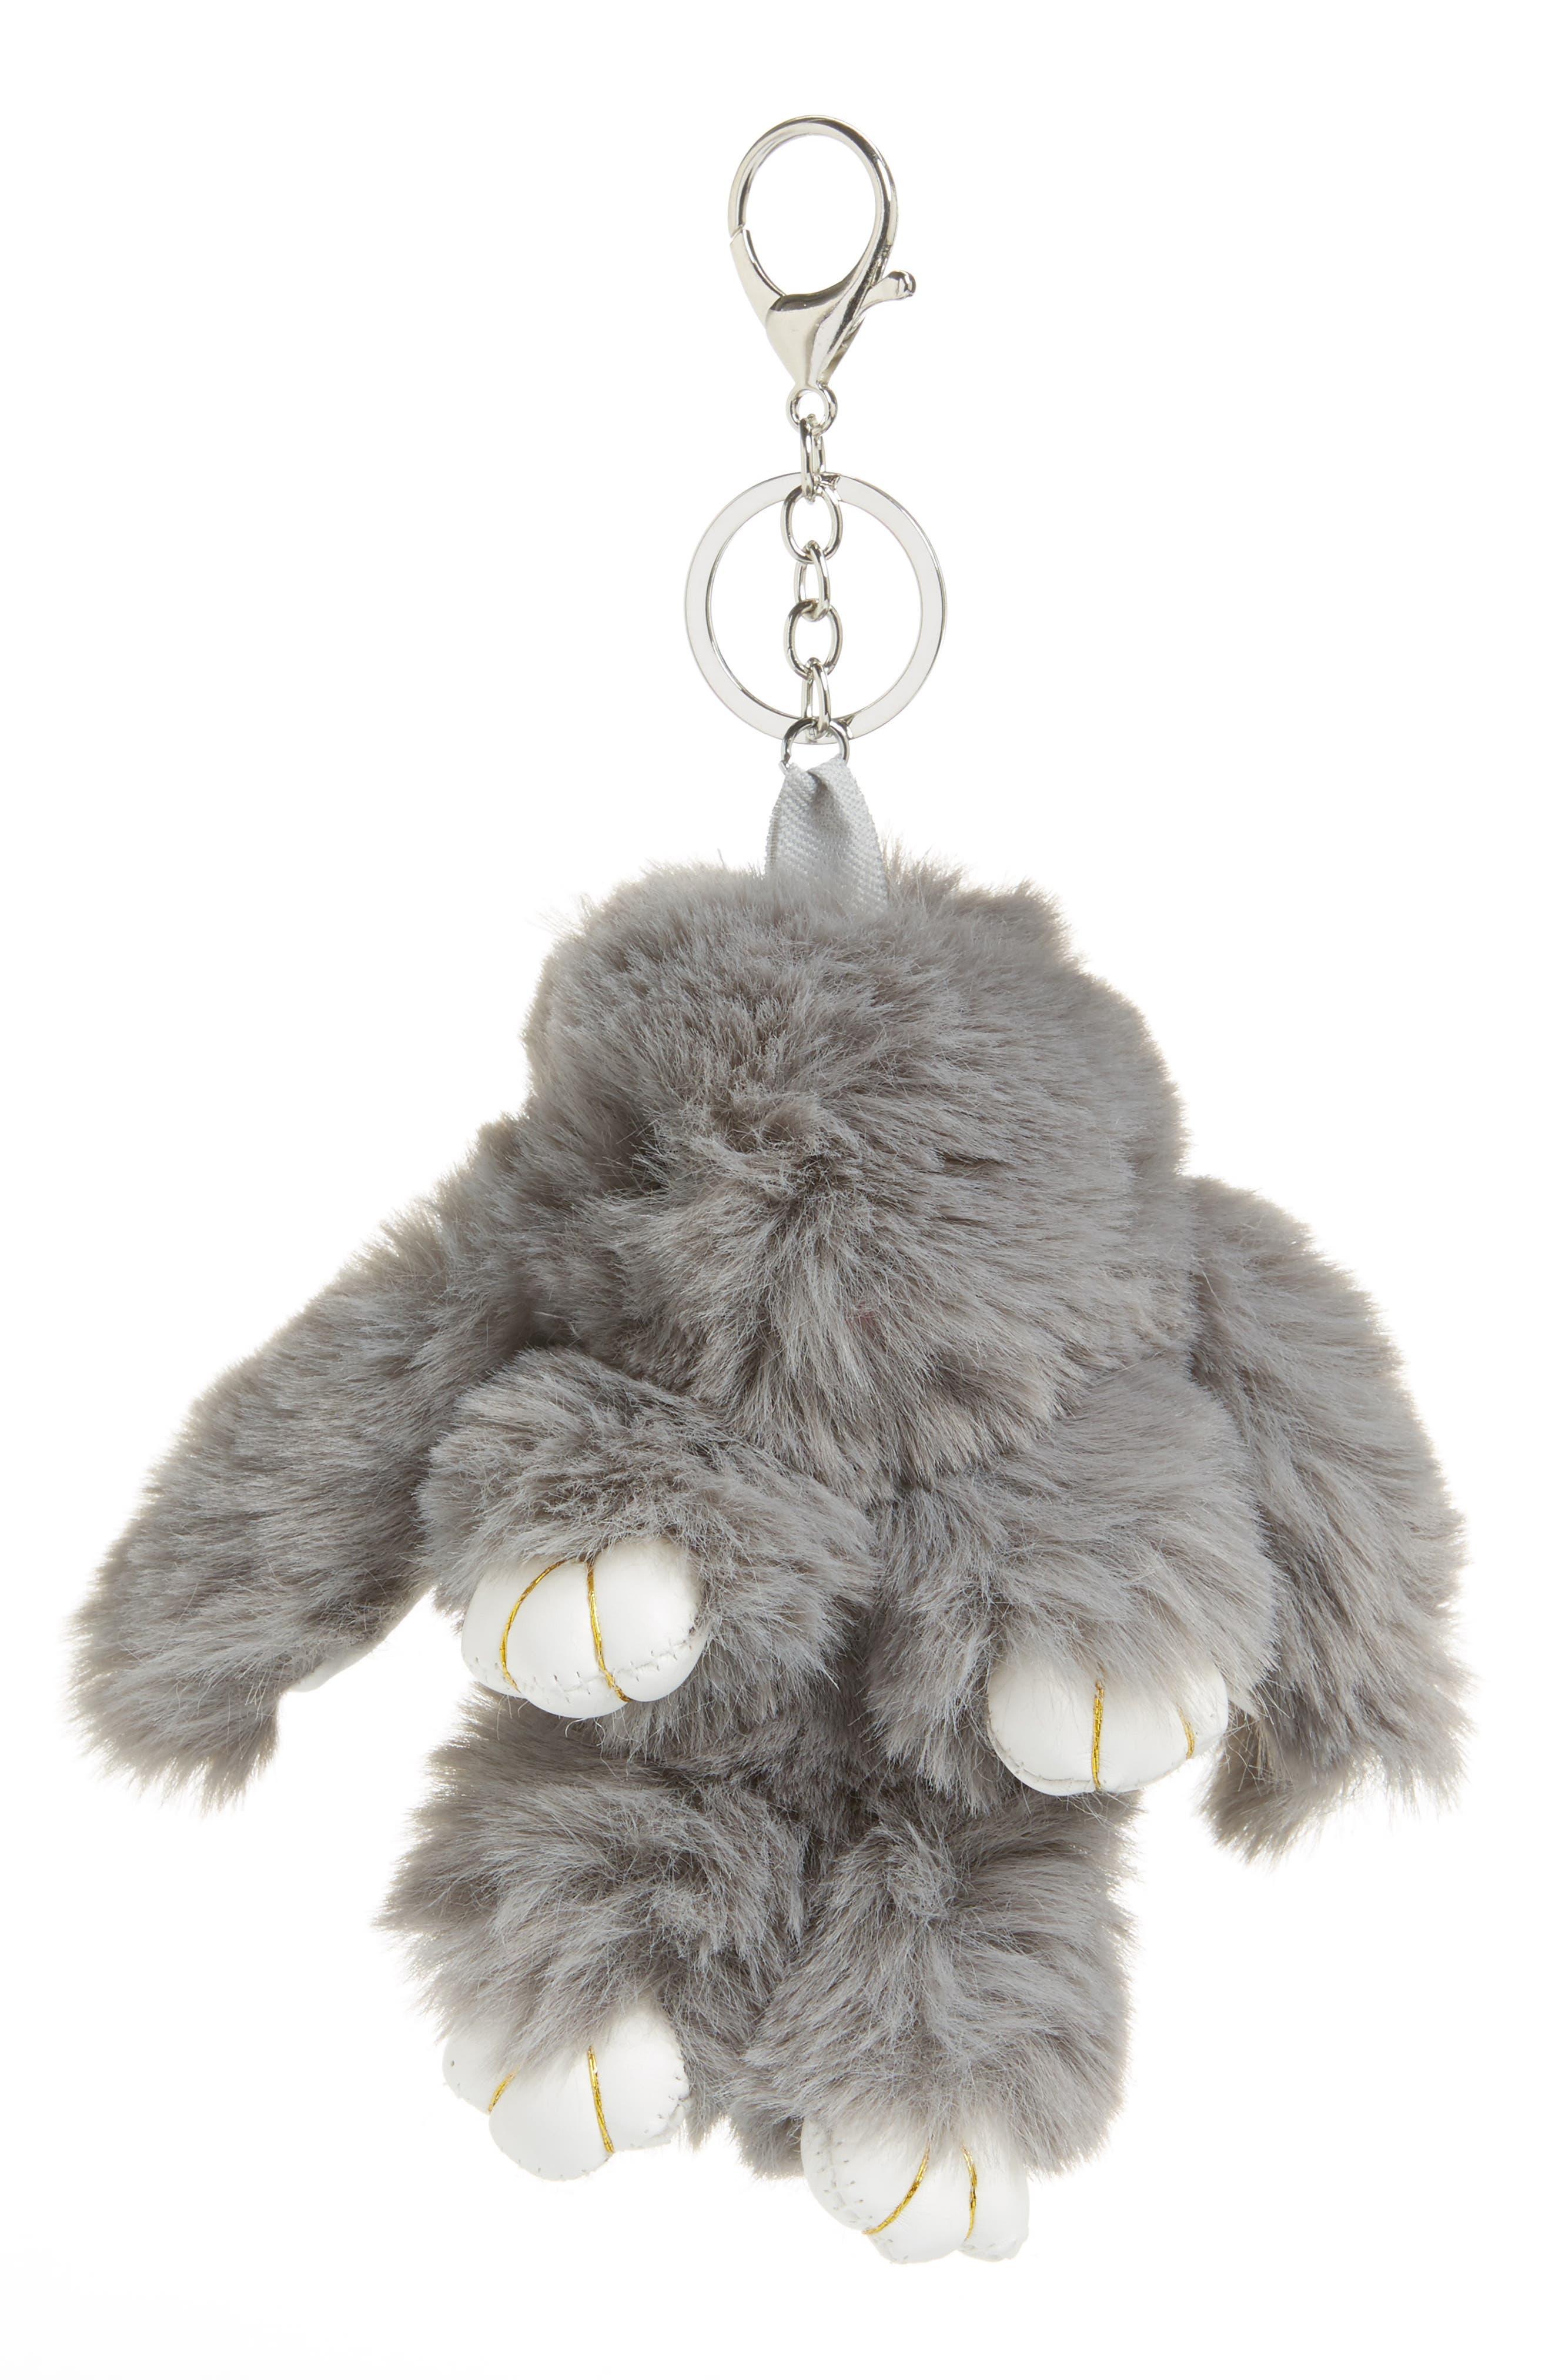 Topshop Fluffy Bunny Keyring